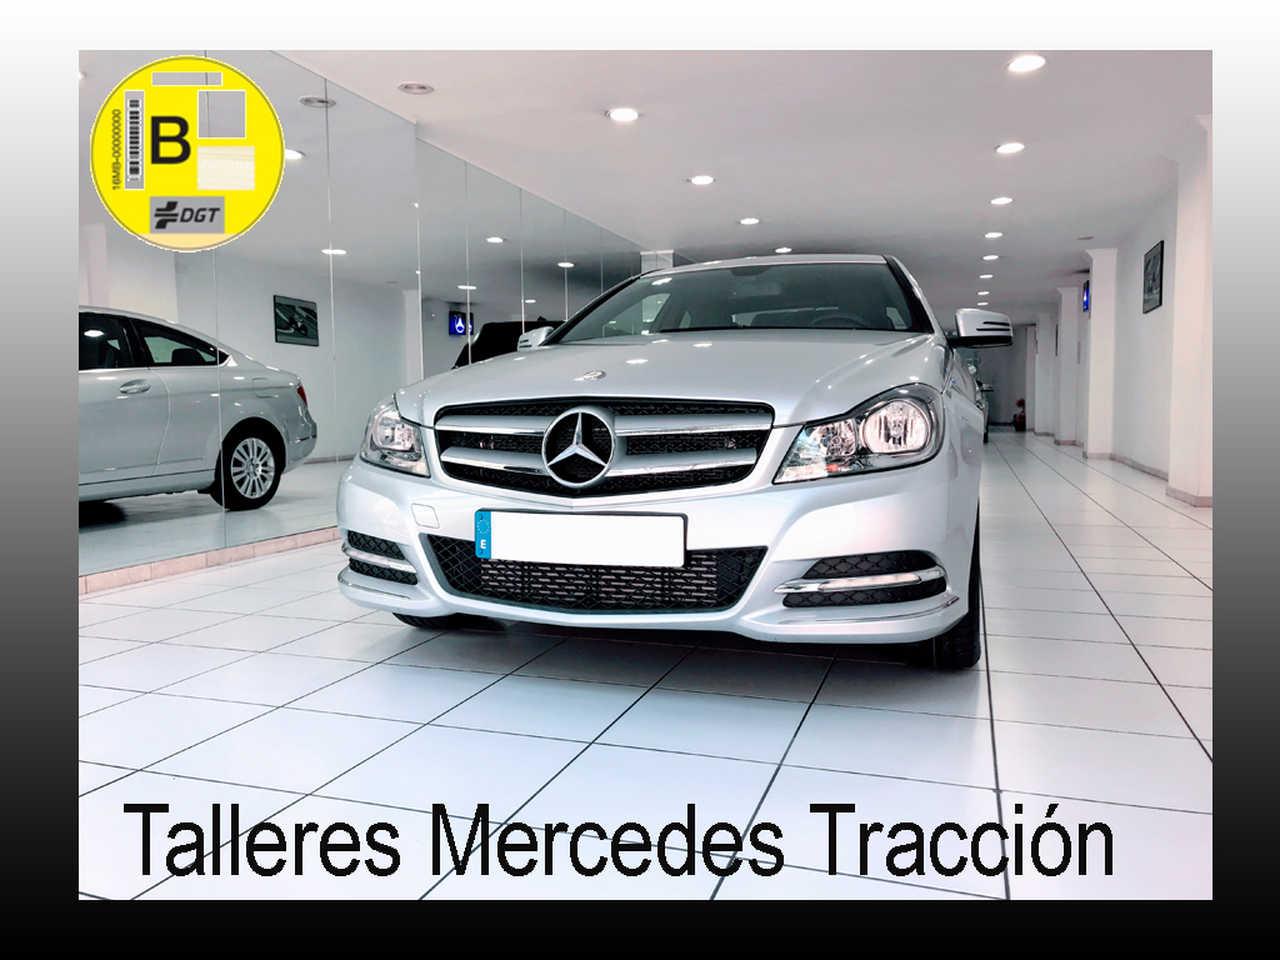 Mercedes Clase C 220 CDI BE Coupe/Navi/Cuero/28.000 km/Nacional   - Foto 1